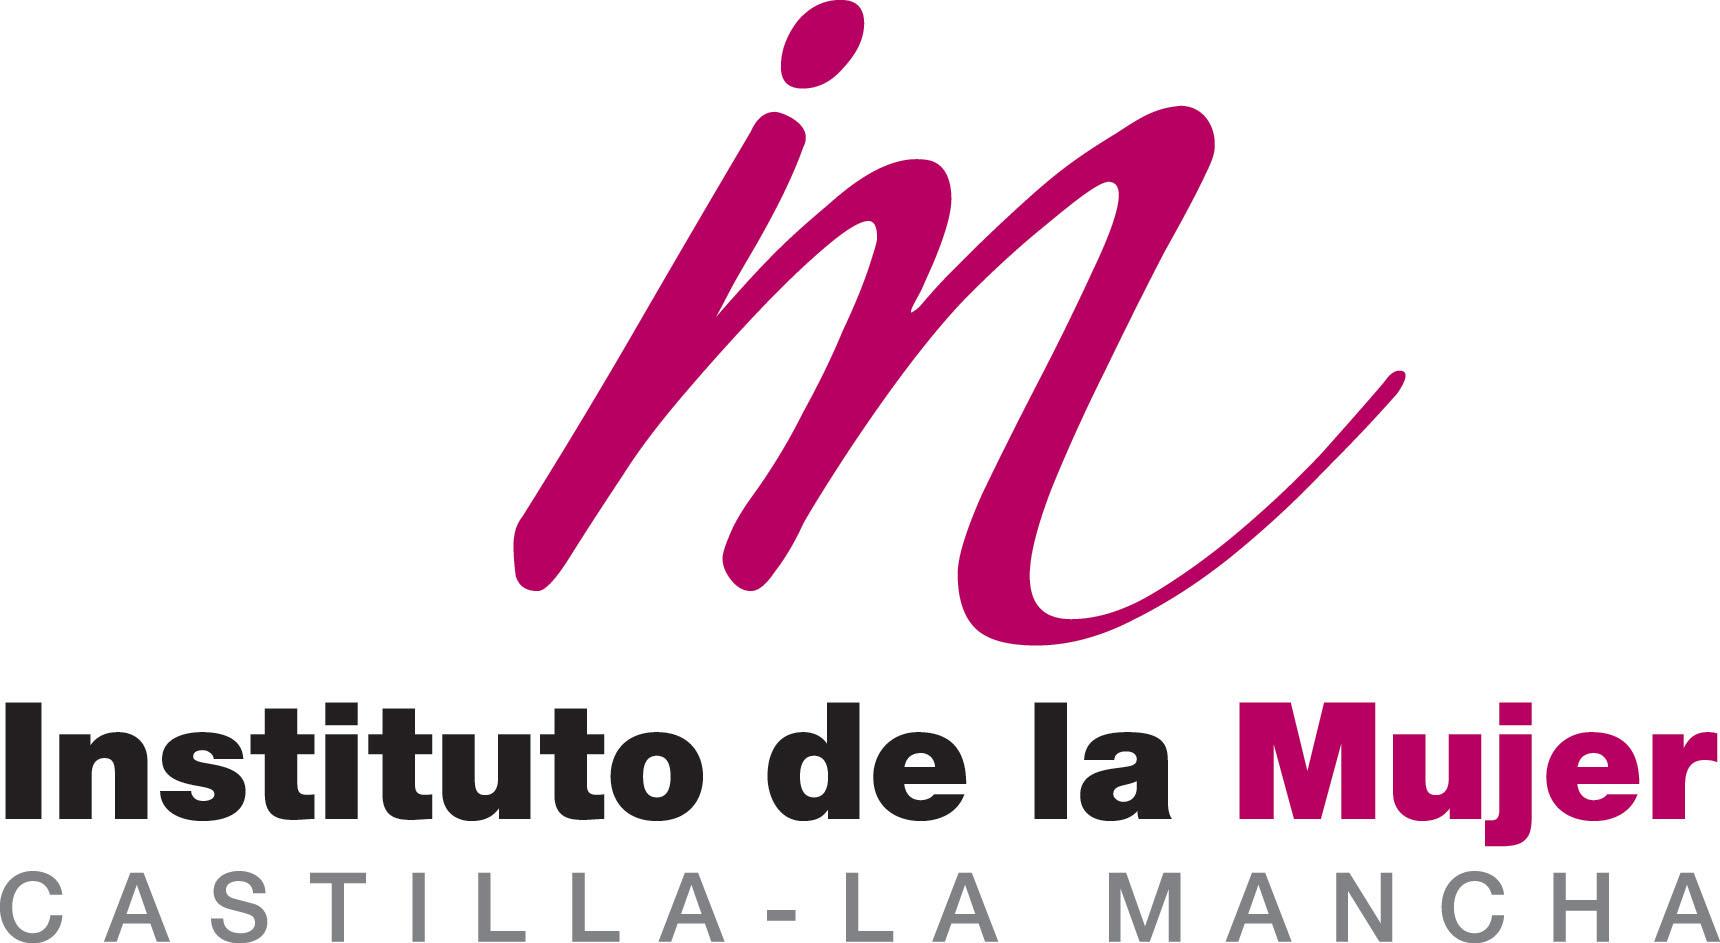 2421bc299 Imagen del logotipo del Instituto de la Mujer de Castilla-La Mancha ...